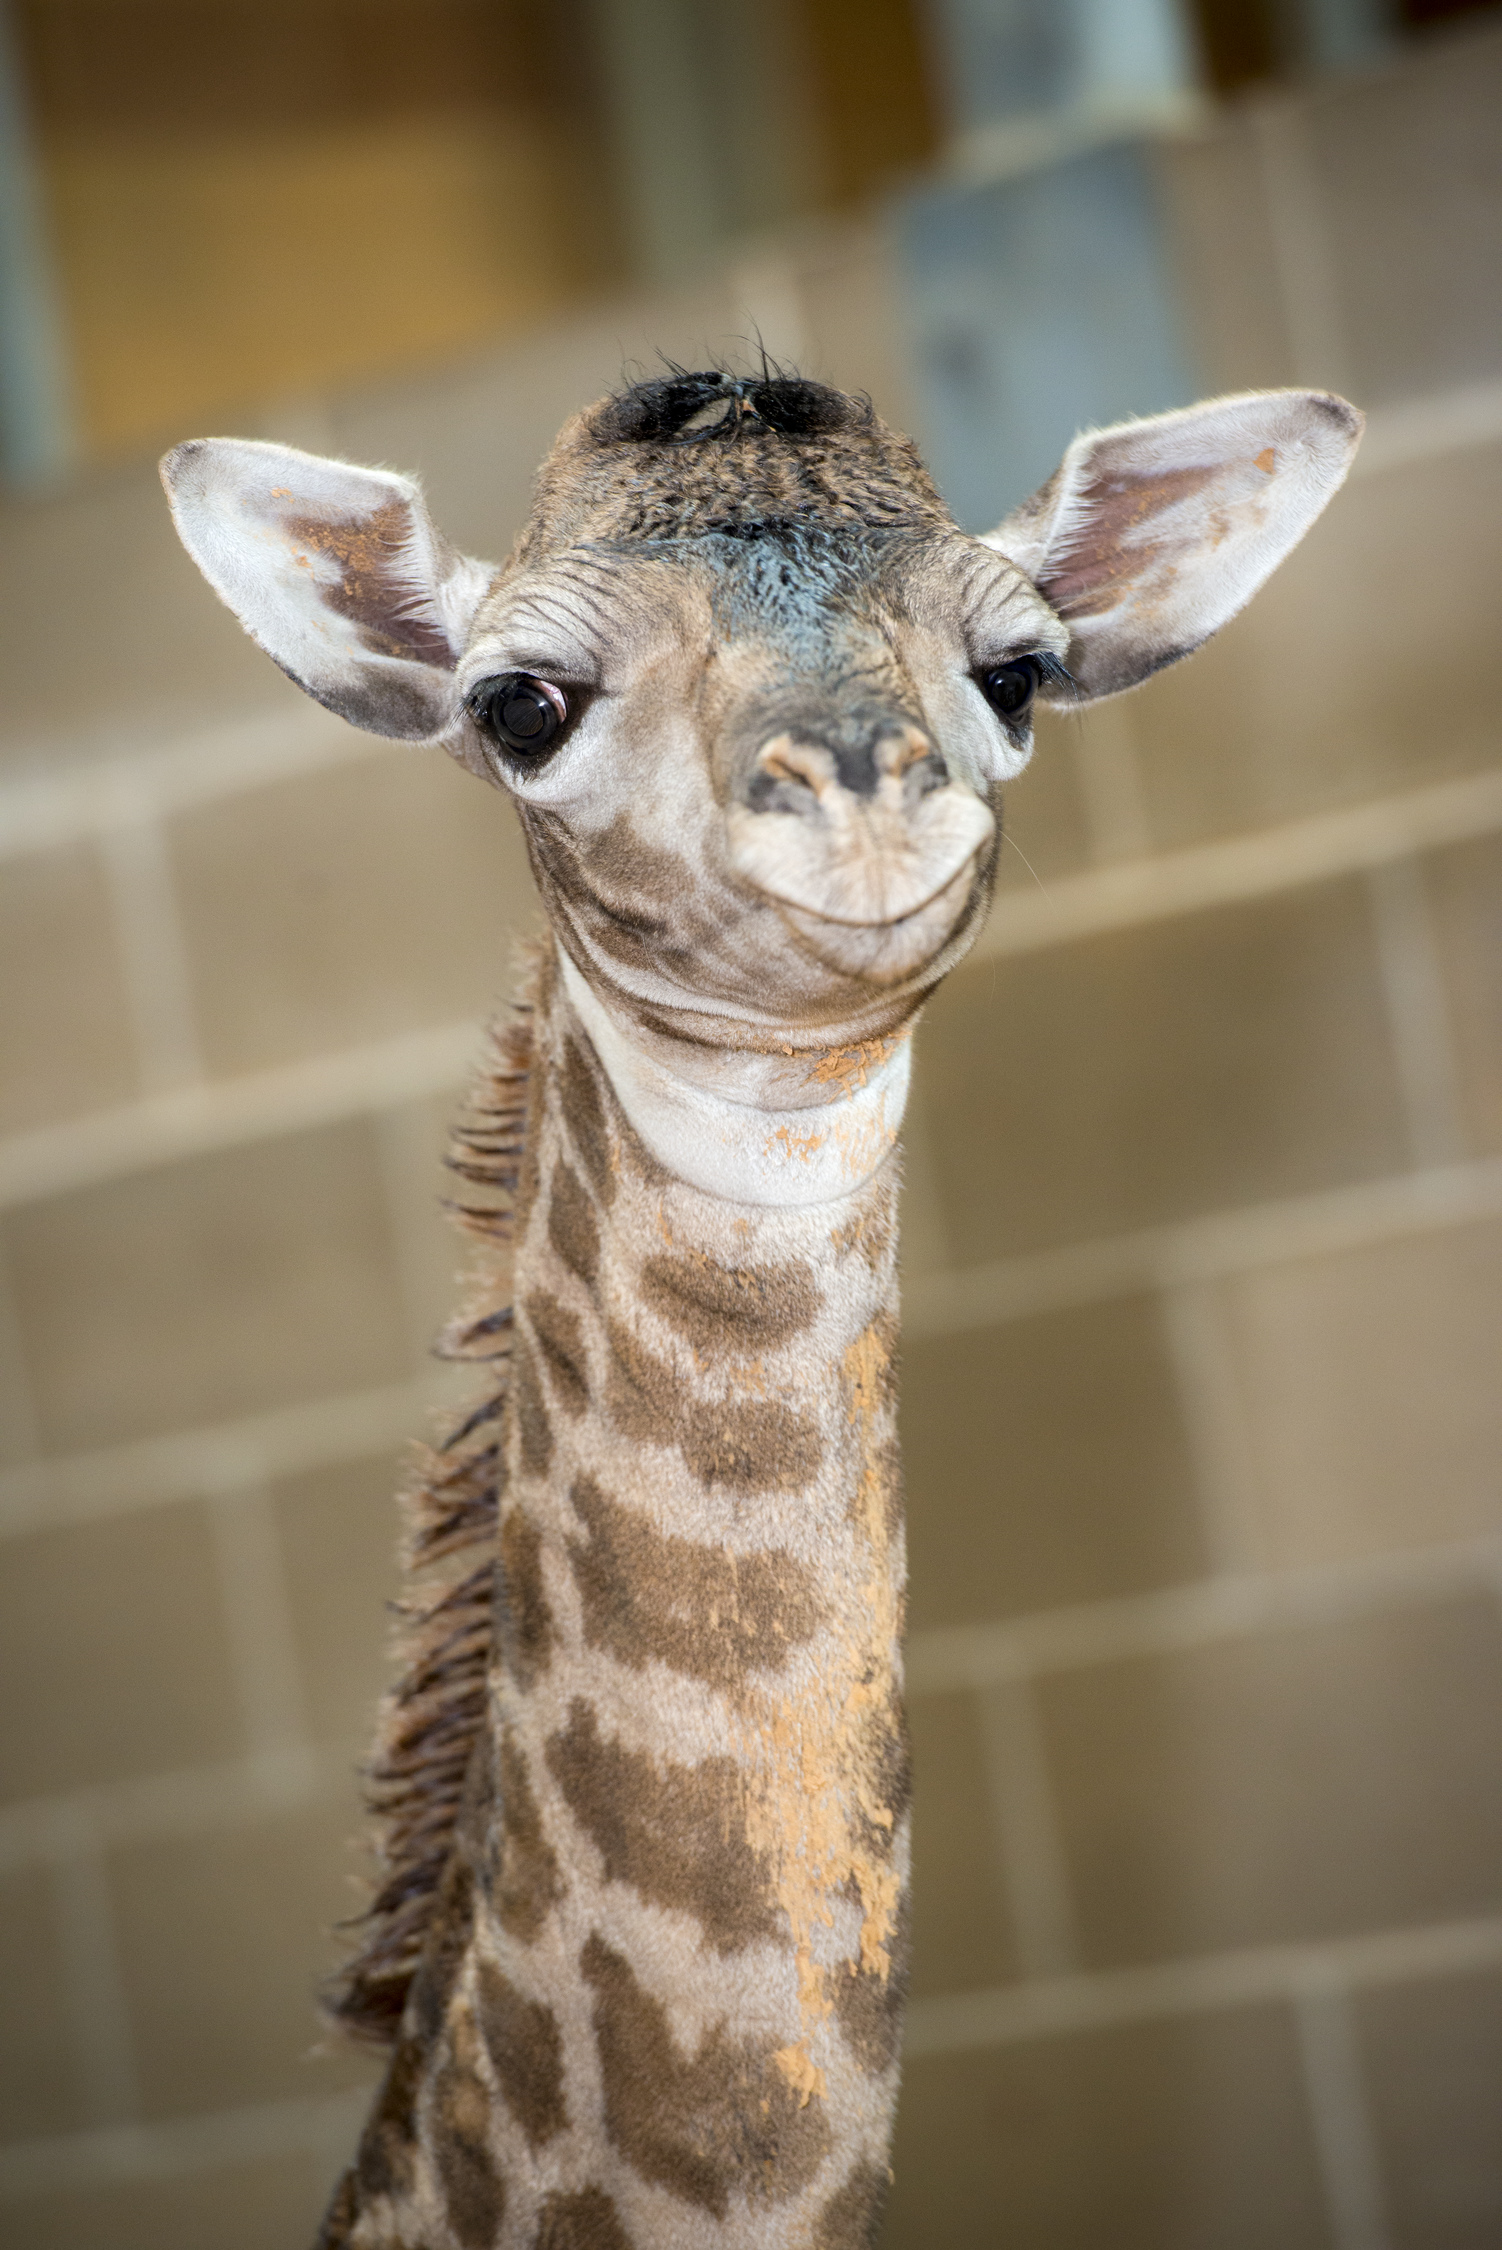 Baby_Giraffe_020414-0006-6620